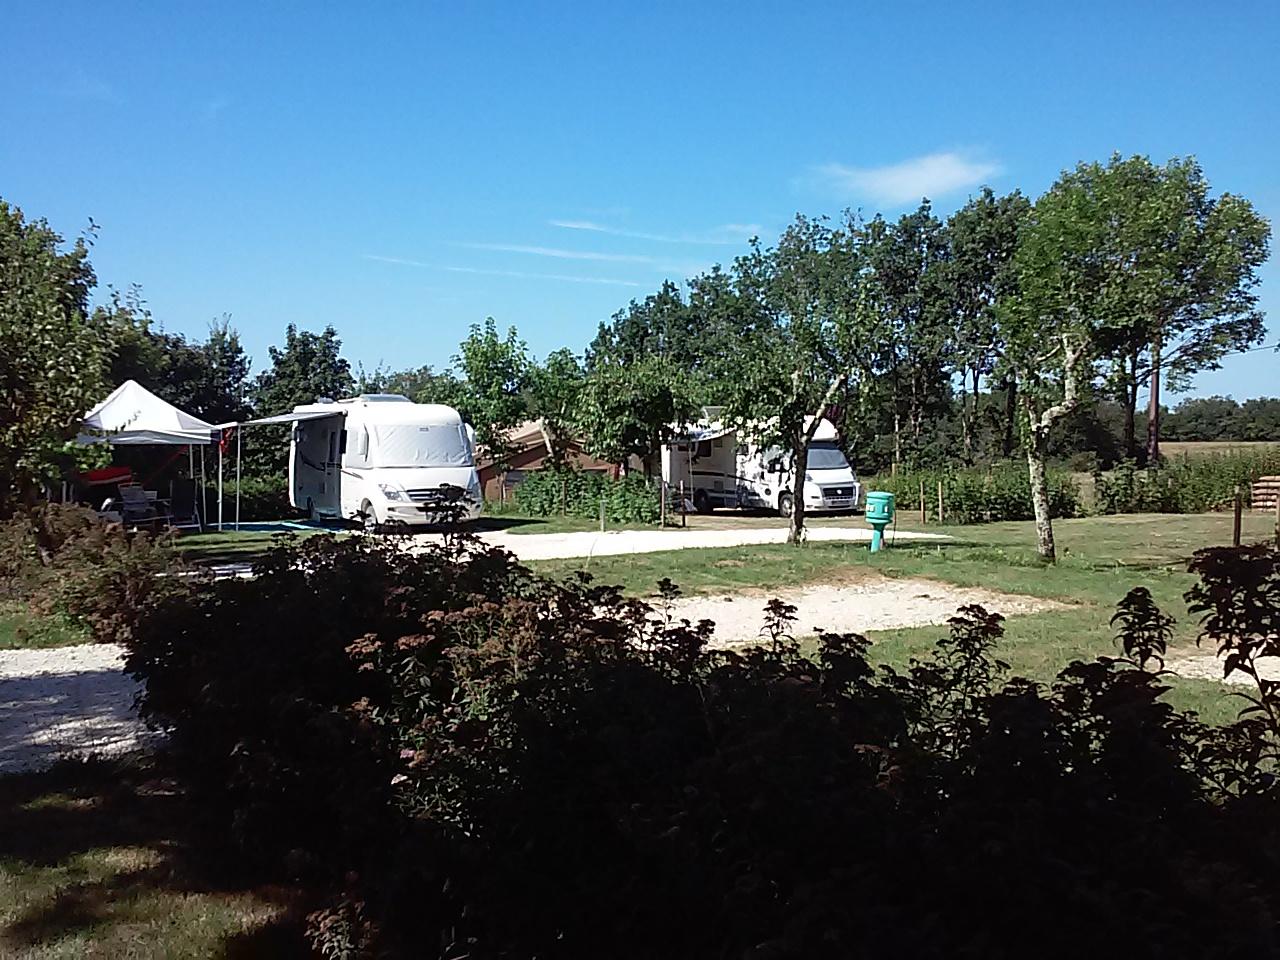 Camping dordogne pas cher 4 toiles promo camping dordogne 4 toiles for Camping dordogne avec piscine pas cher